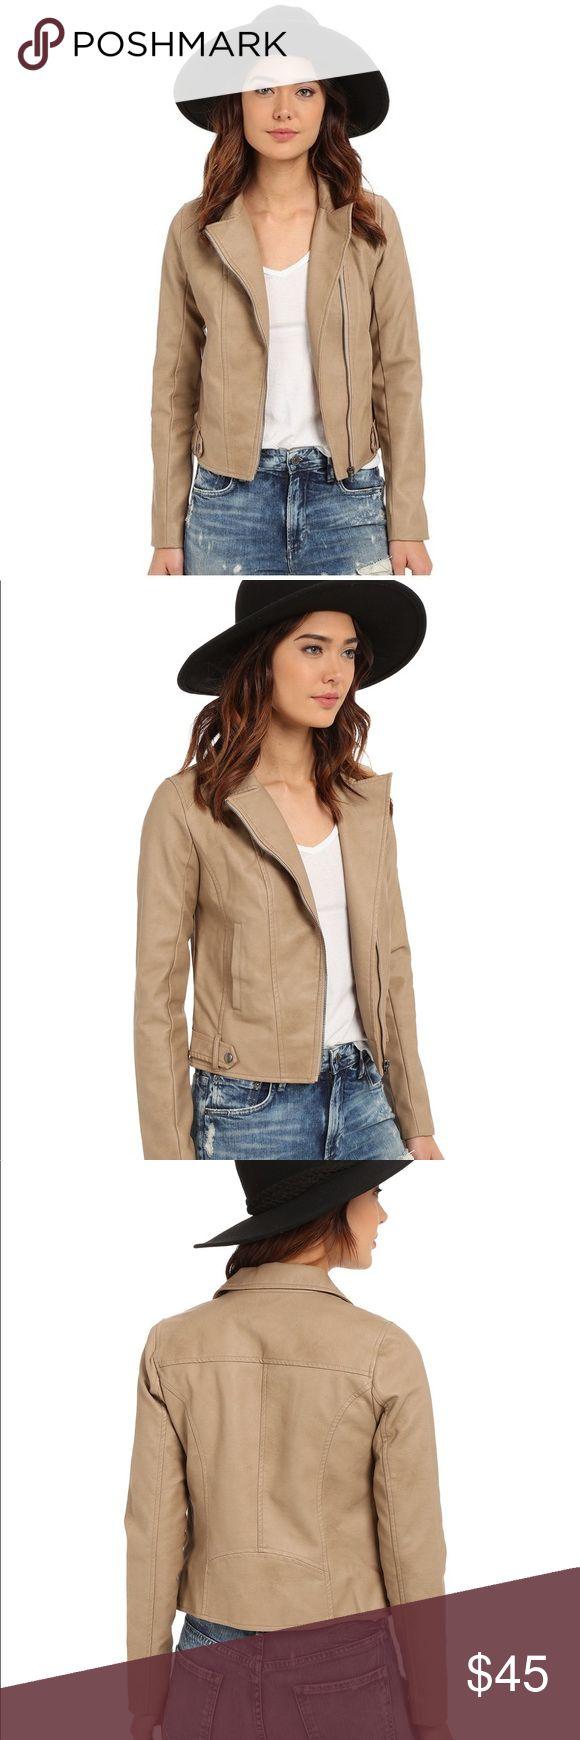 Jack by BB Dakota Kenickie Jacket (Light Khaki) Leather jacket in perfect condition. Only worn once. Jack by BB Dakota Jackets & Coats